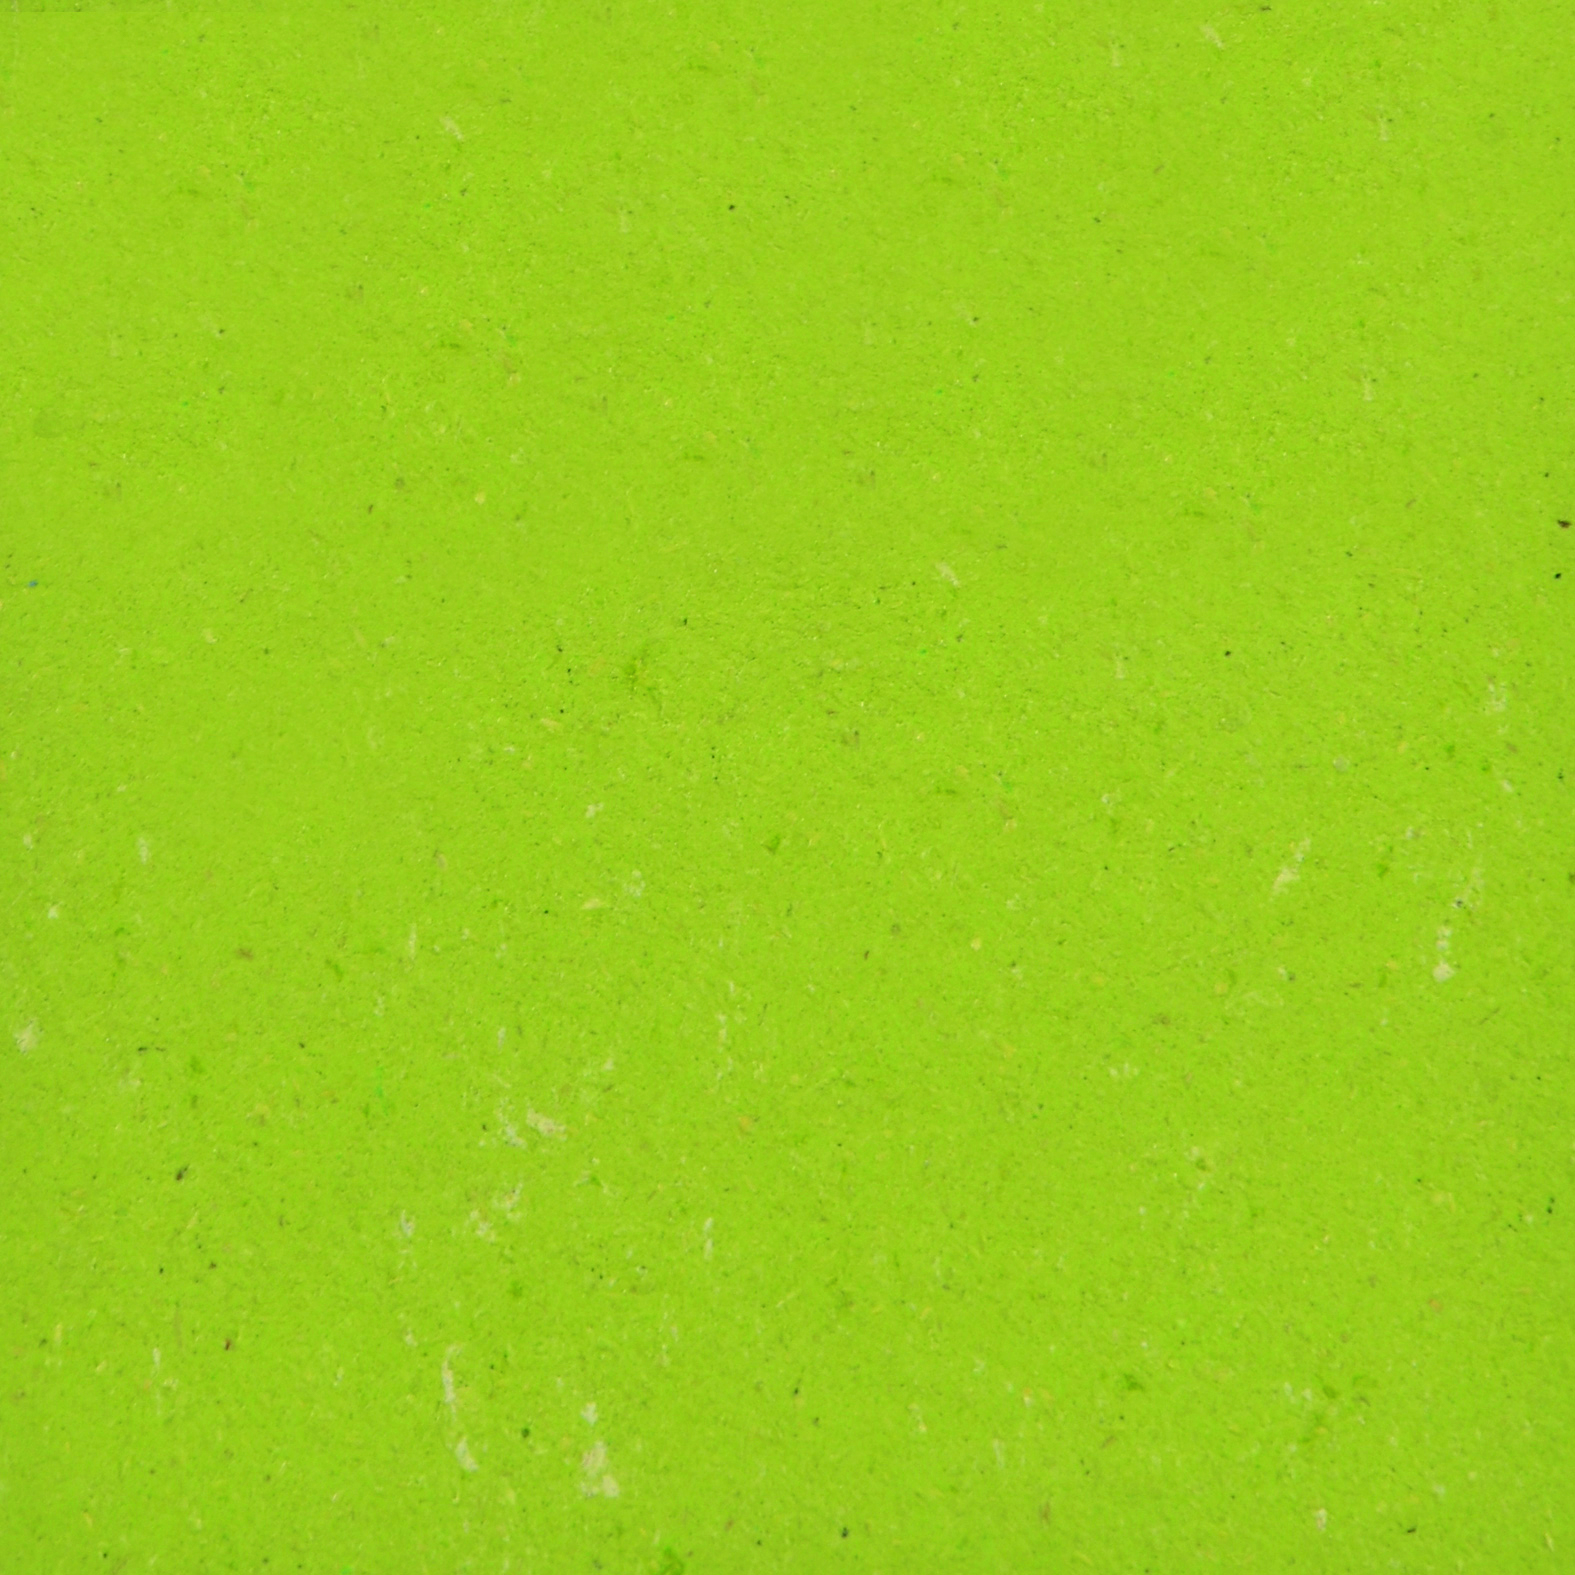 Tabelle-12-Linoleum-limonengr-nzn2J3h5Ubf9vJ